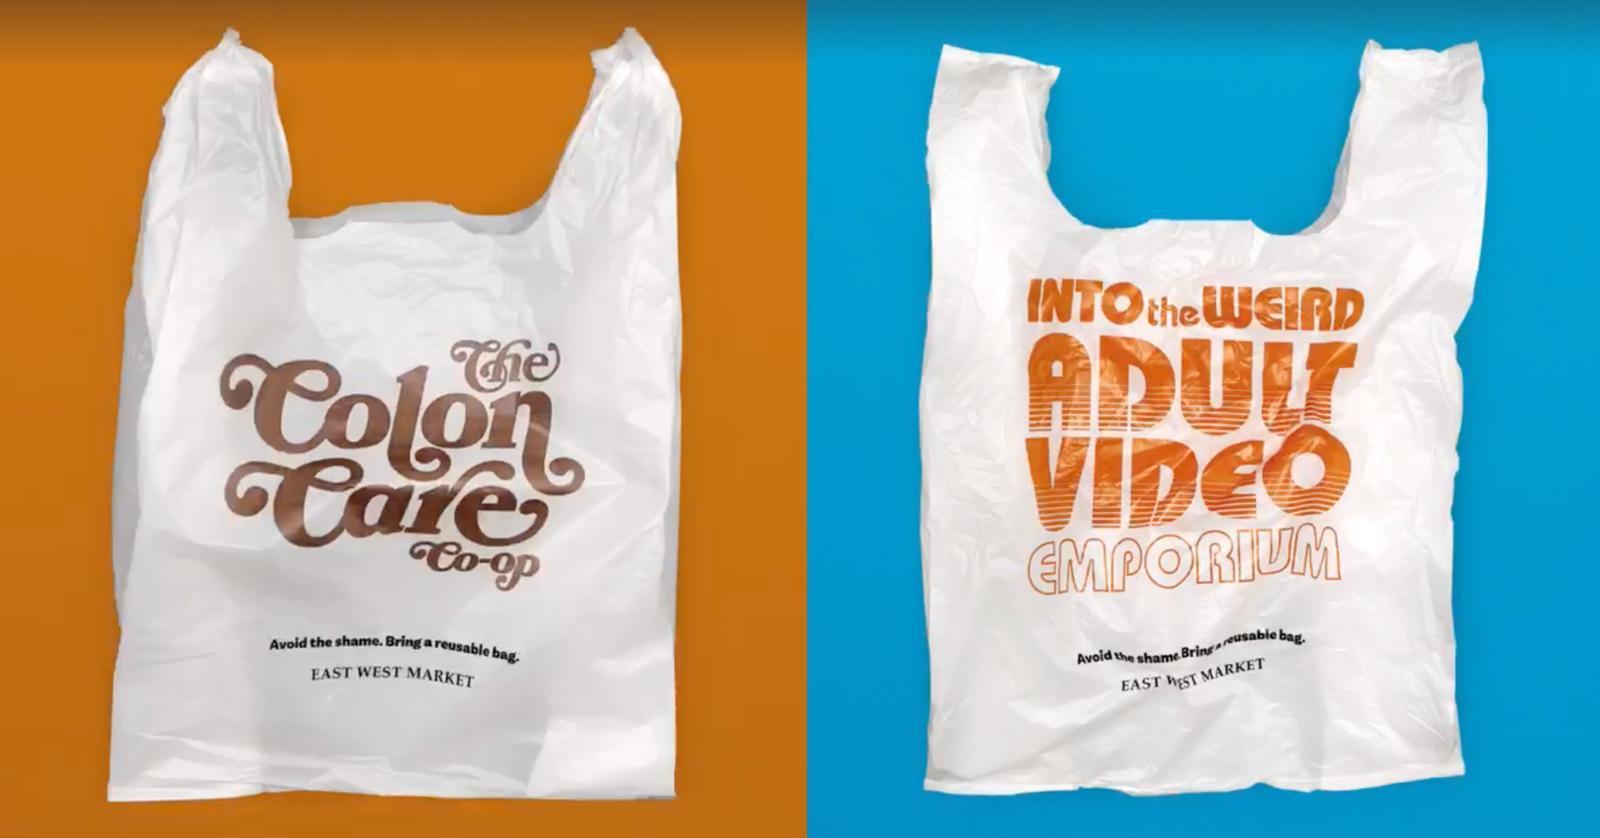 plastic-bag-shame-1560439894424.jpg